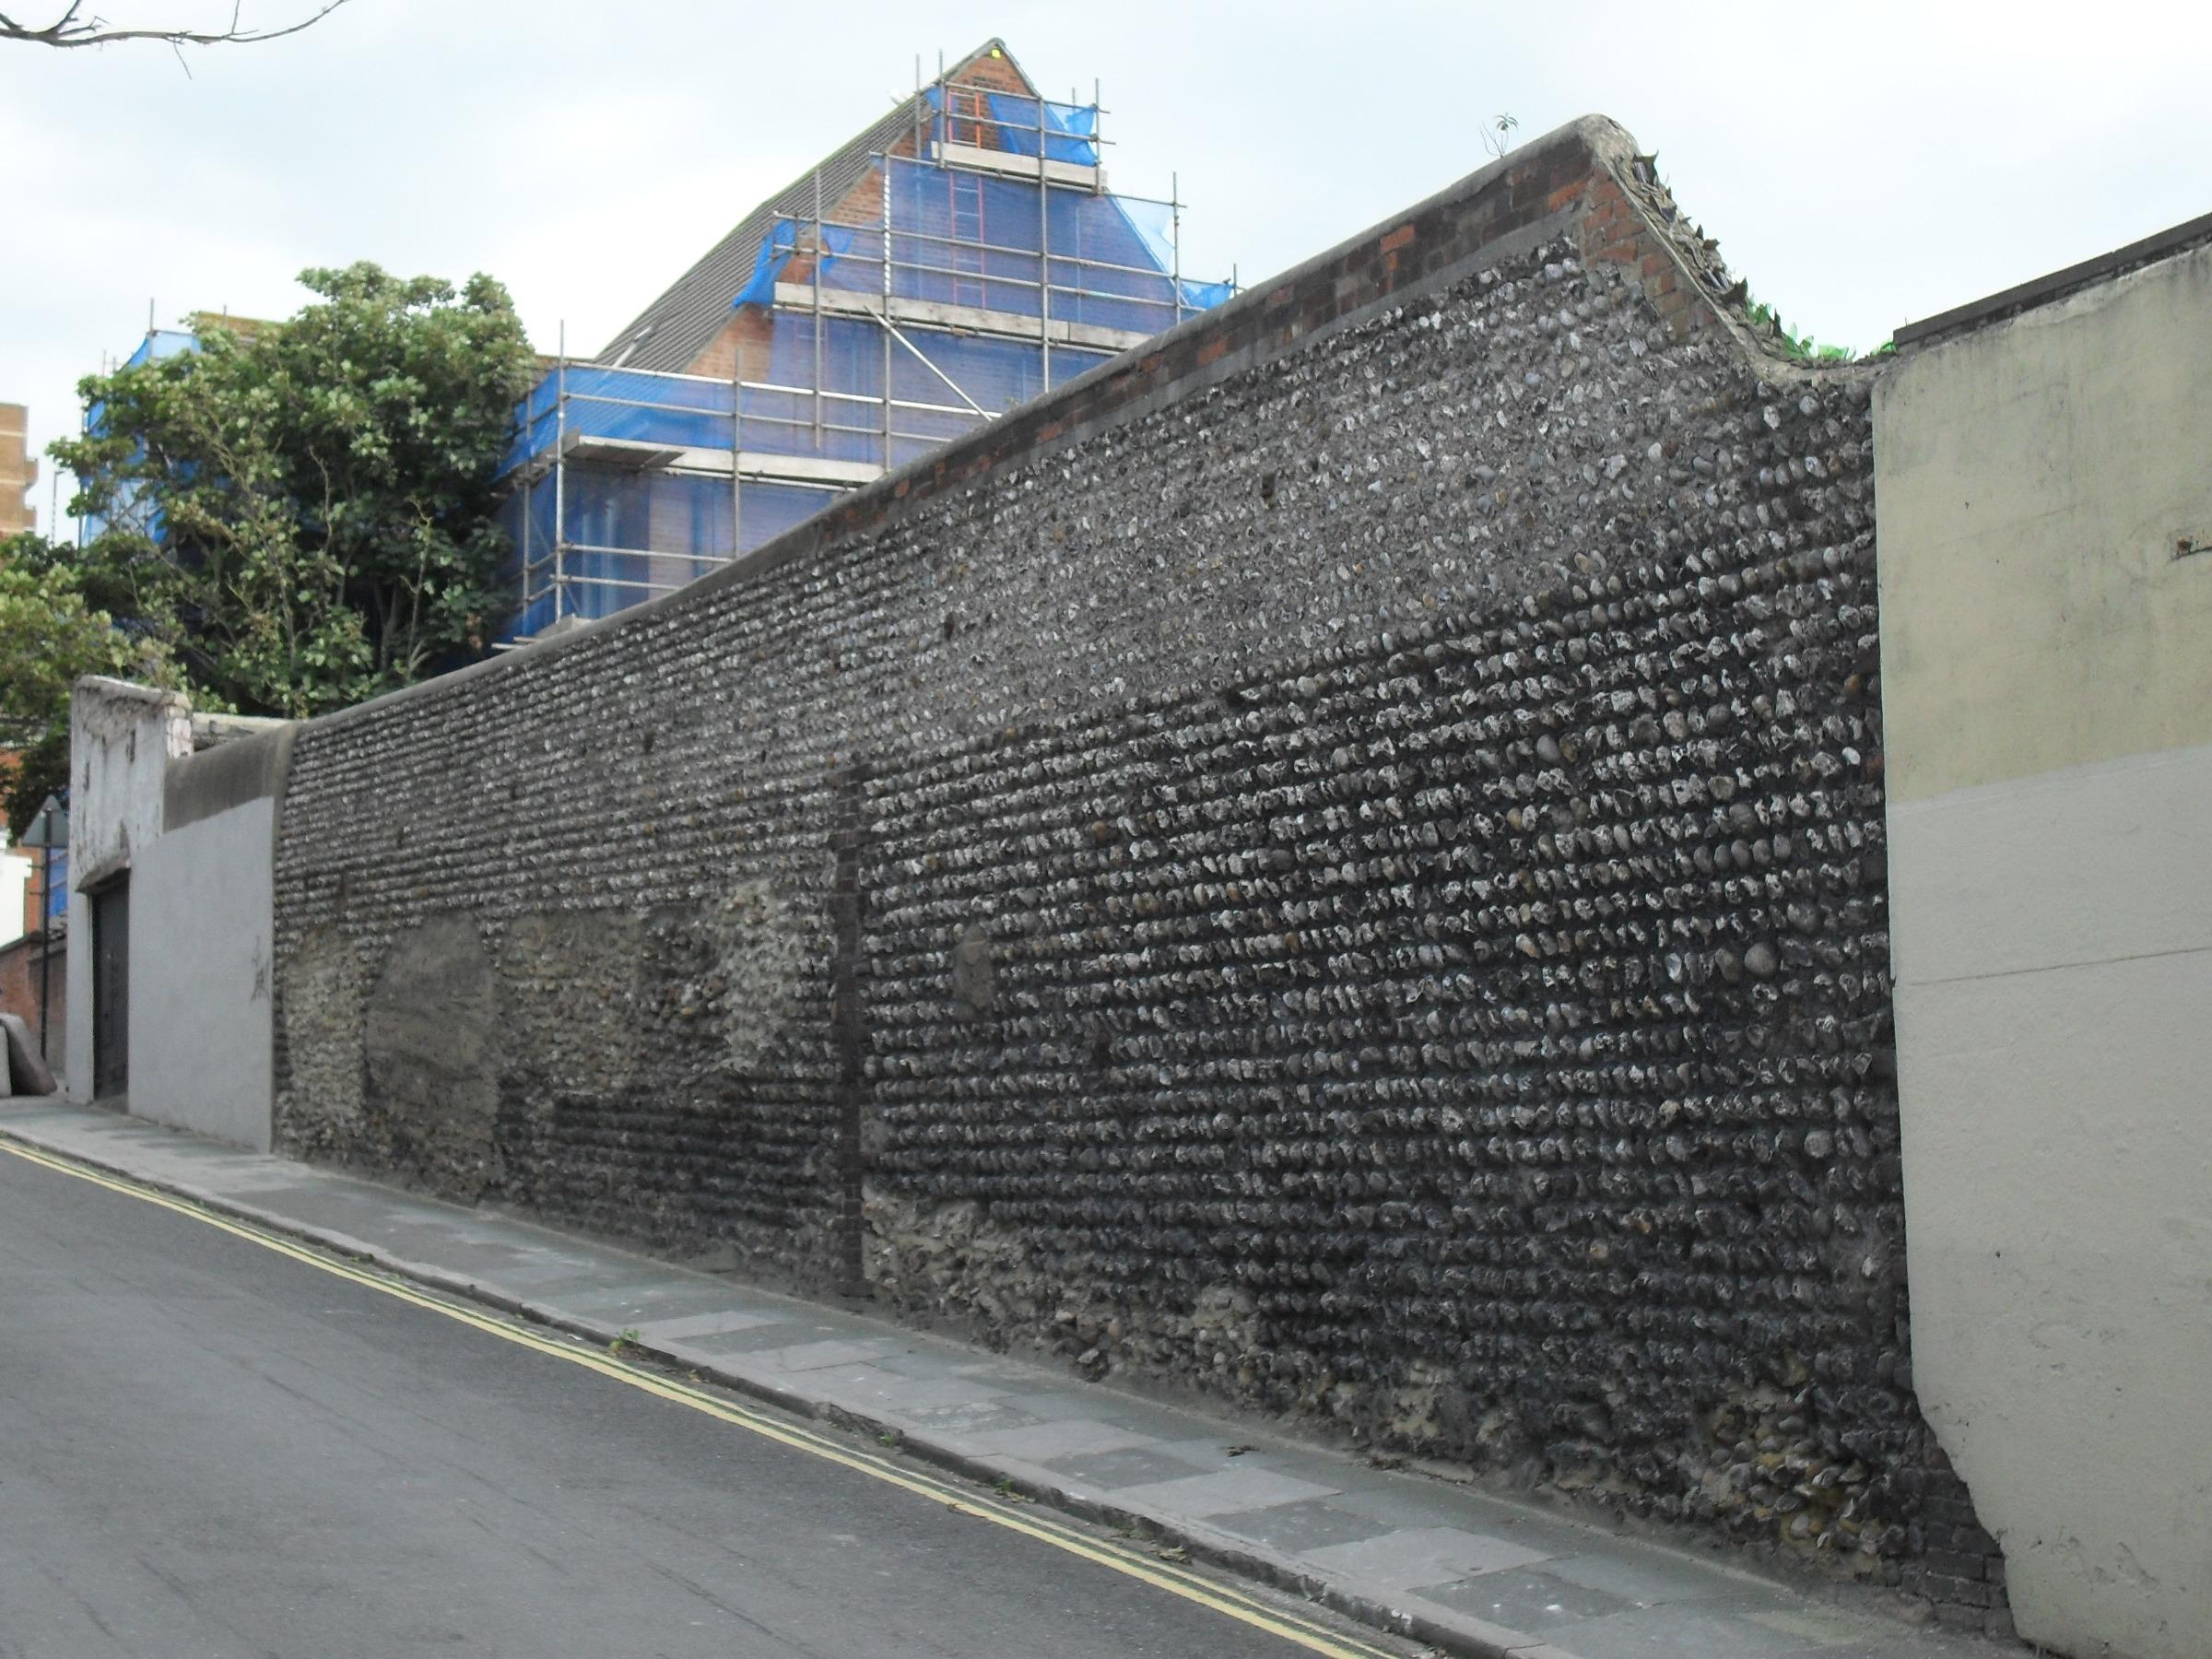 Bamboo Boundary Wall Design : File flint wall at carlton hill brighton g wikimedia